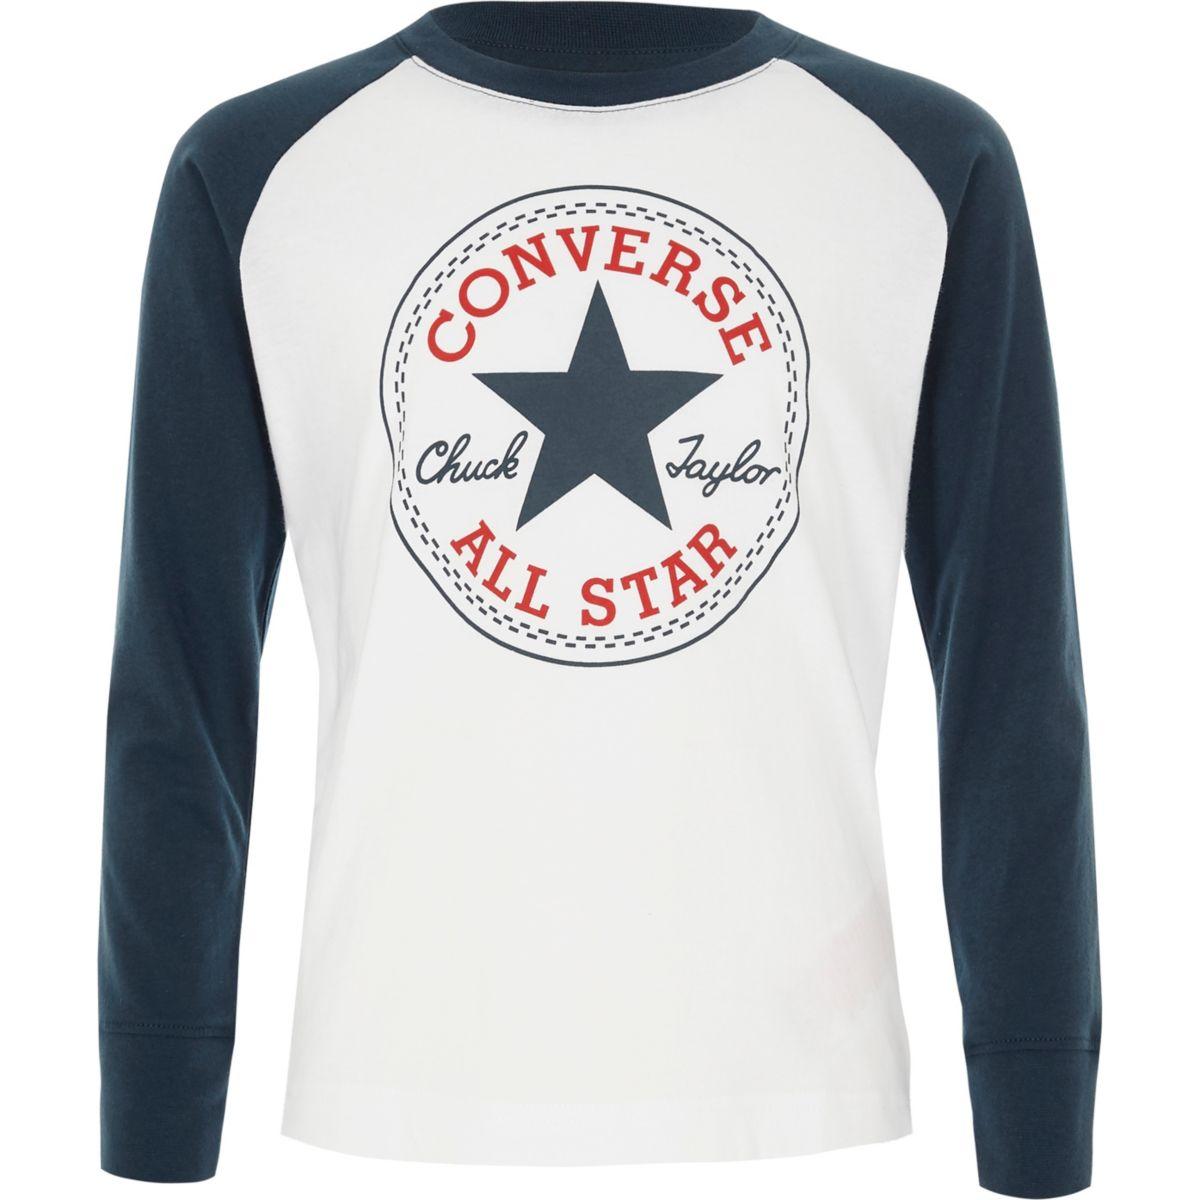 River Island T-shirt manches longues Converse pour gar?on